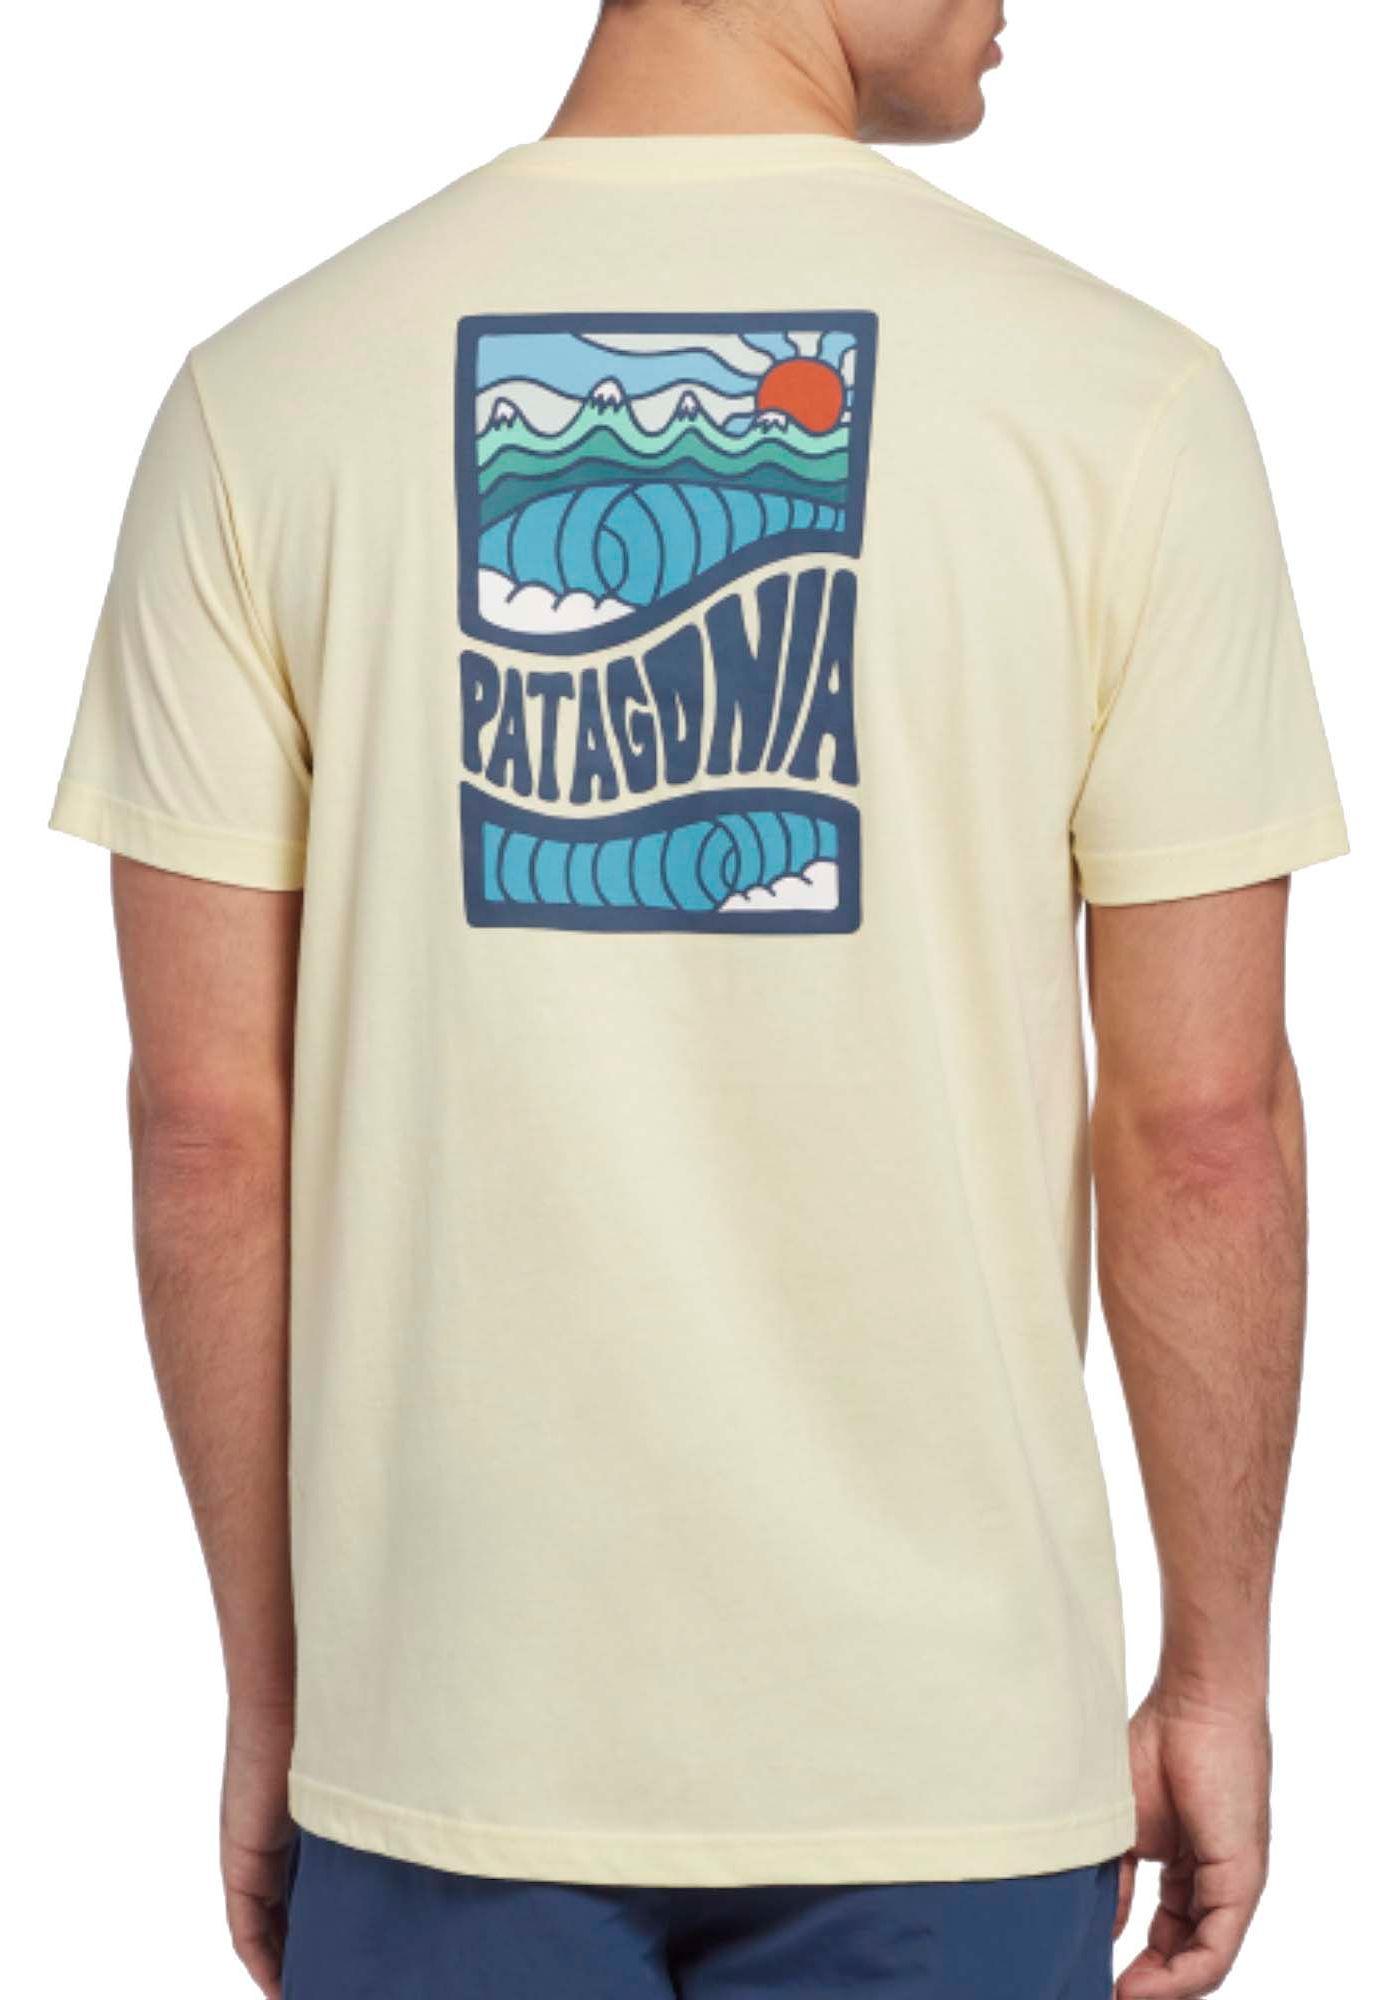 Patagonia Men's Cosmic Peaks Organic Short Sleeve T-Shirt